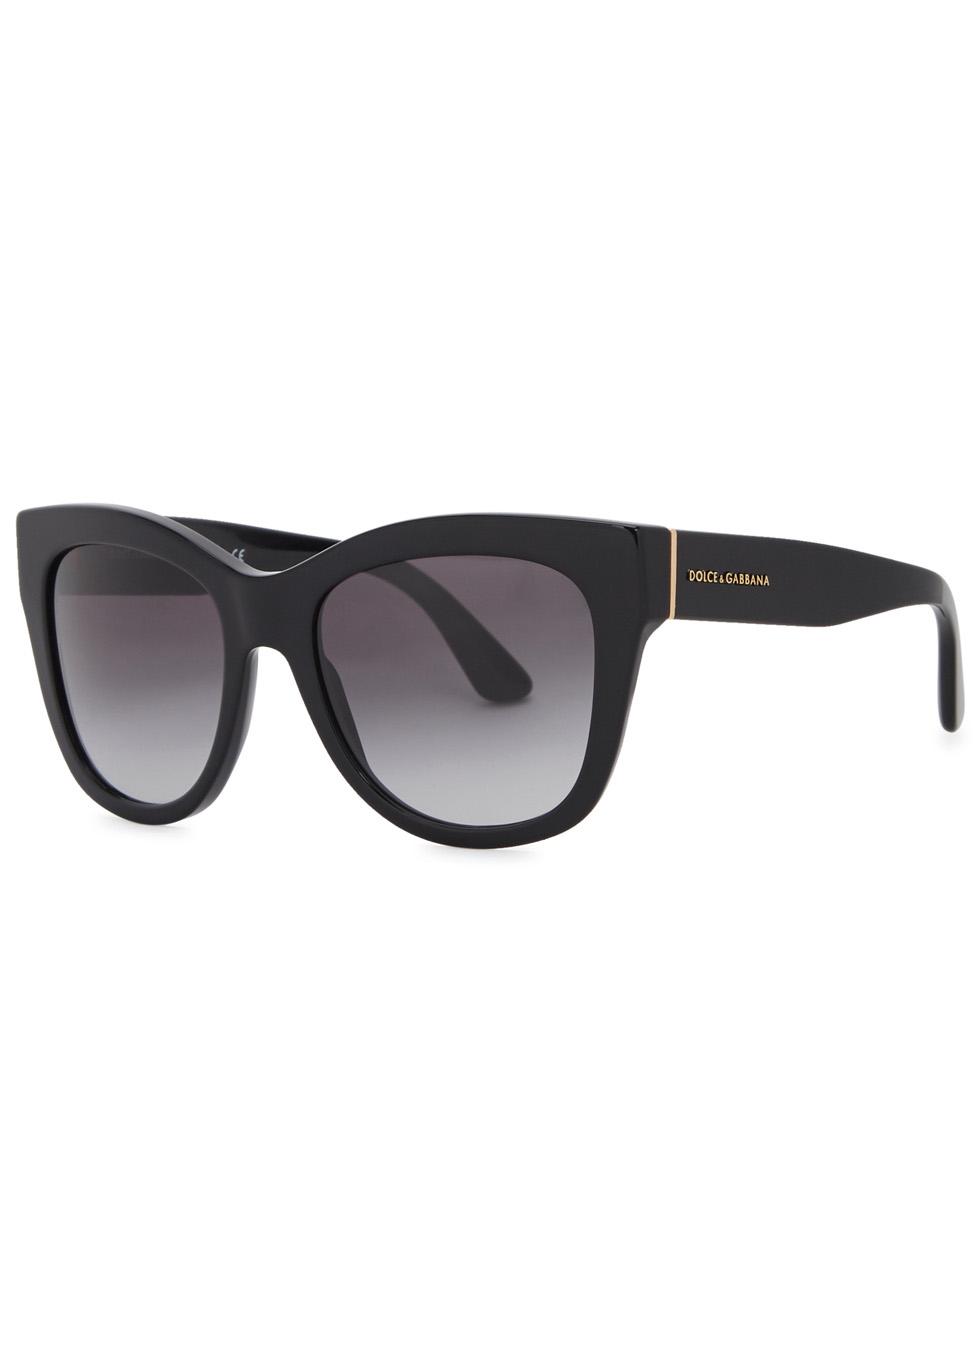 Black oversized sunglasses - Dolce & Gabbana